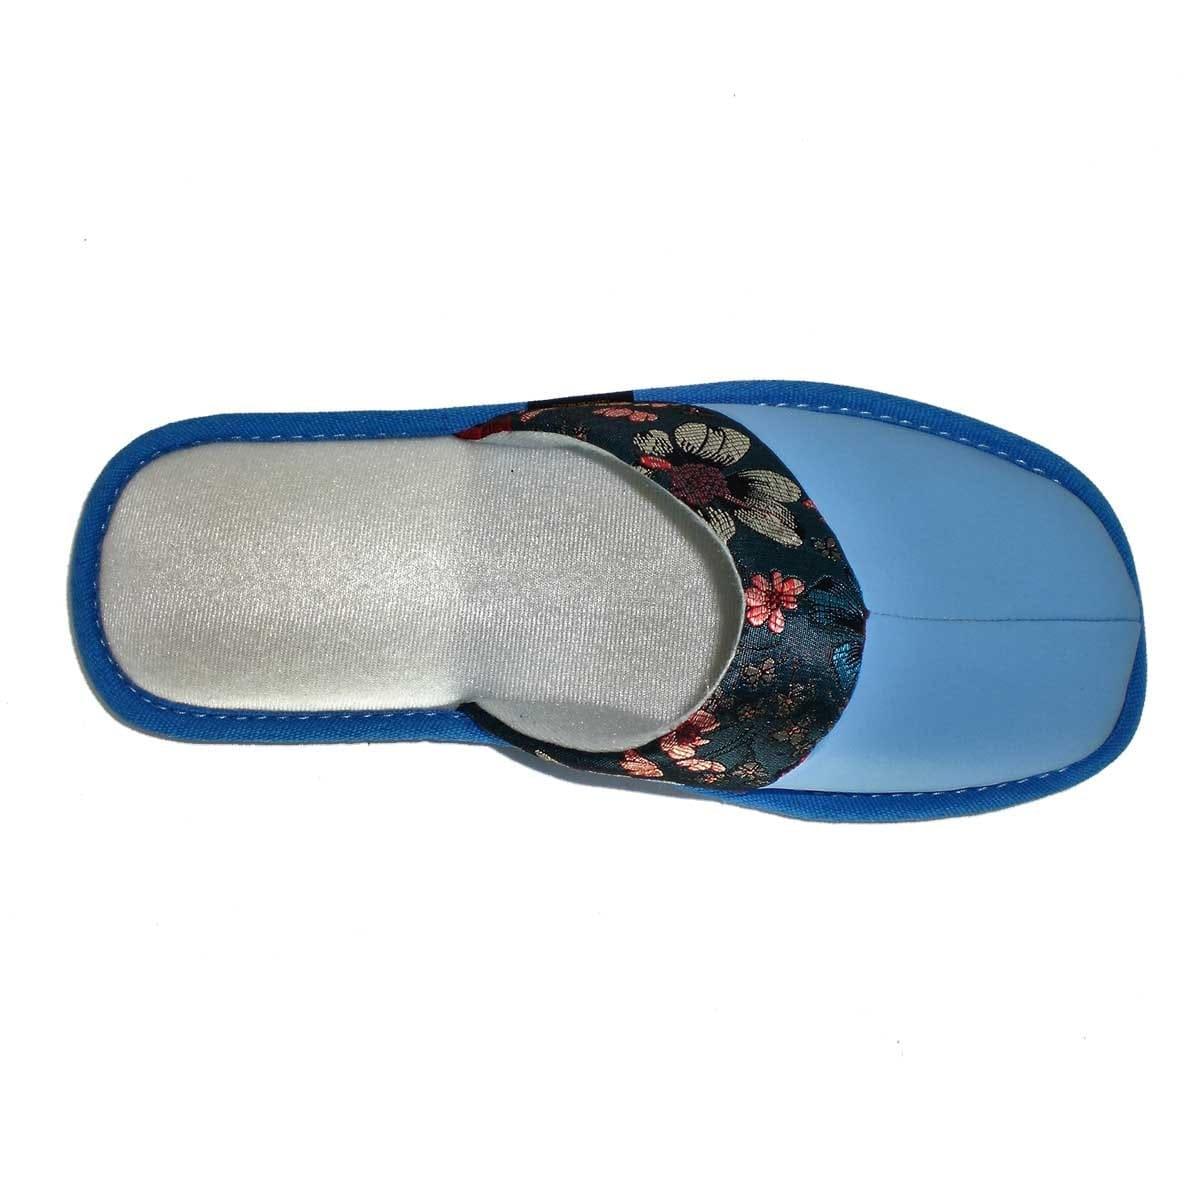 Pantufla con Estampado Calzatura